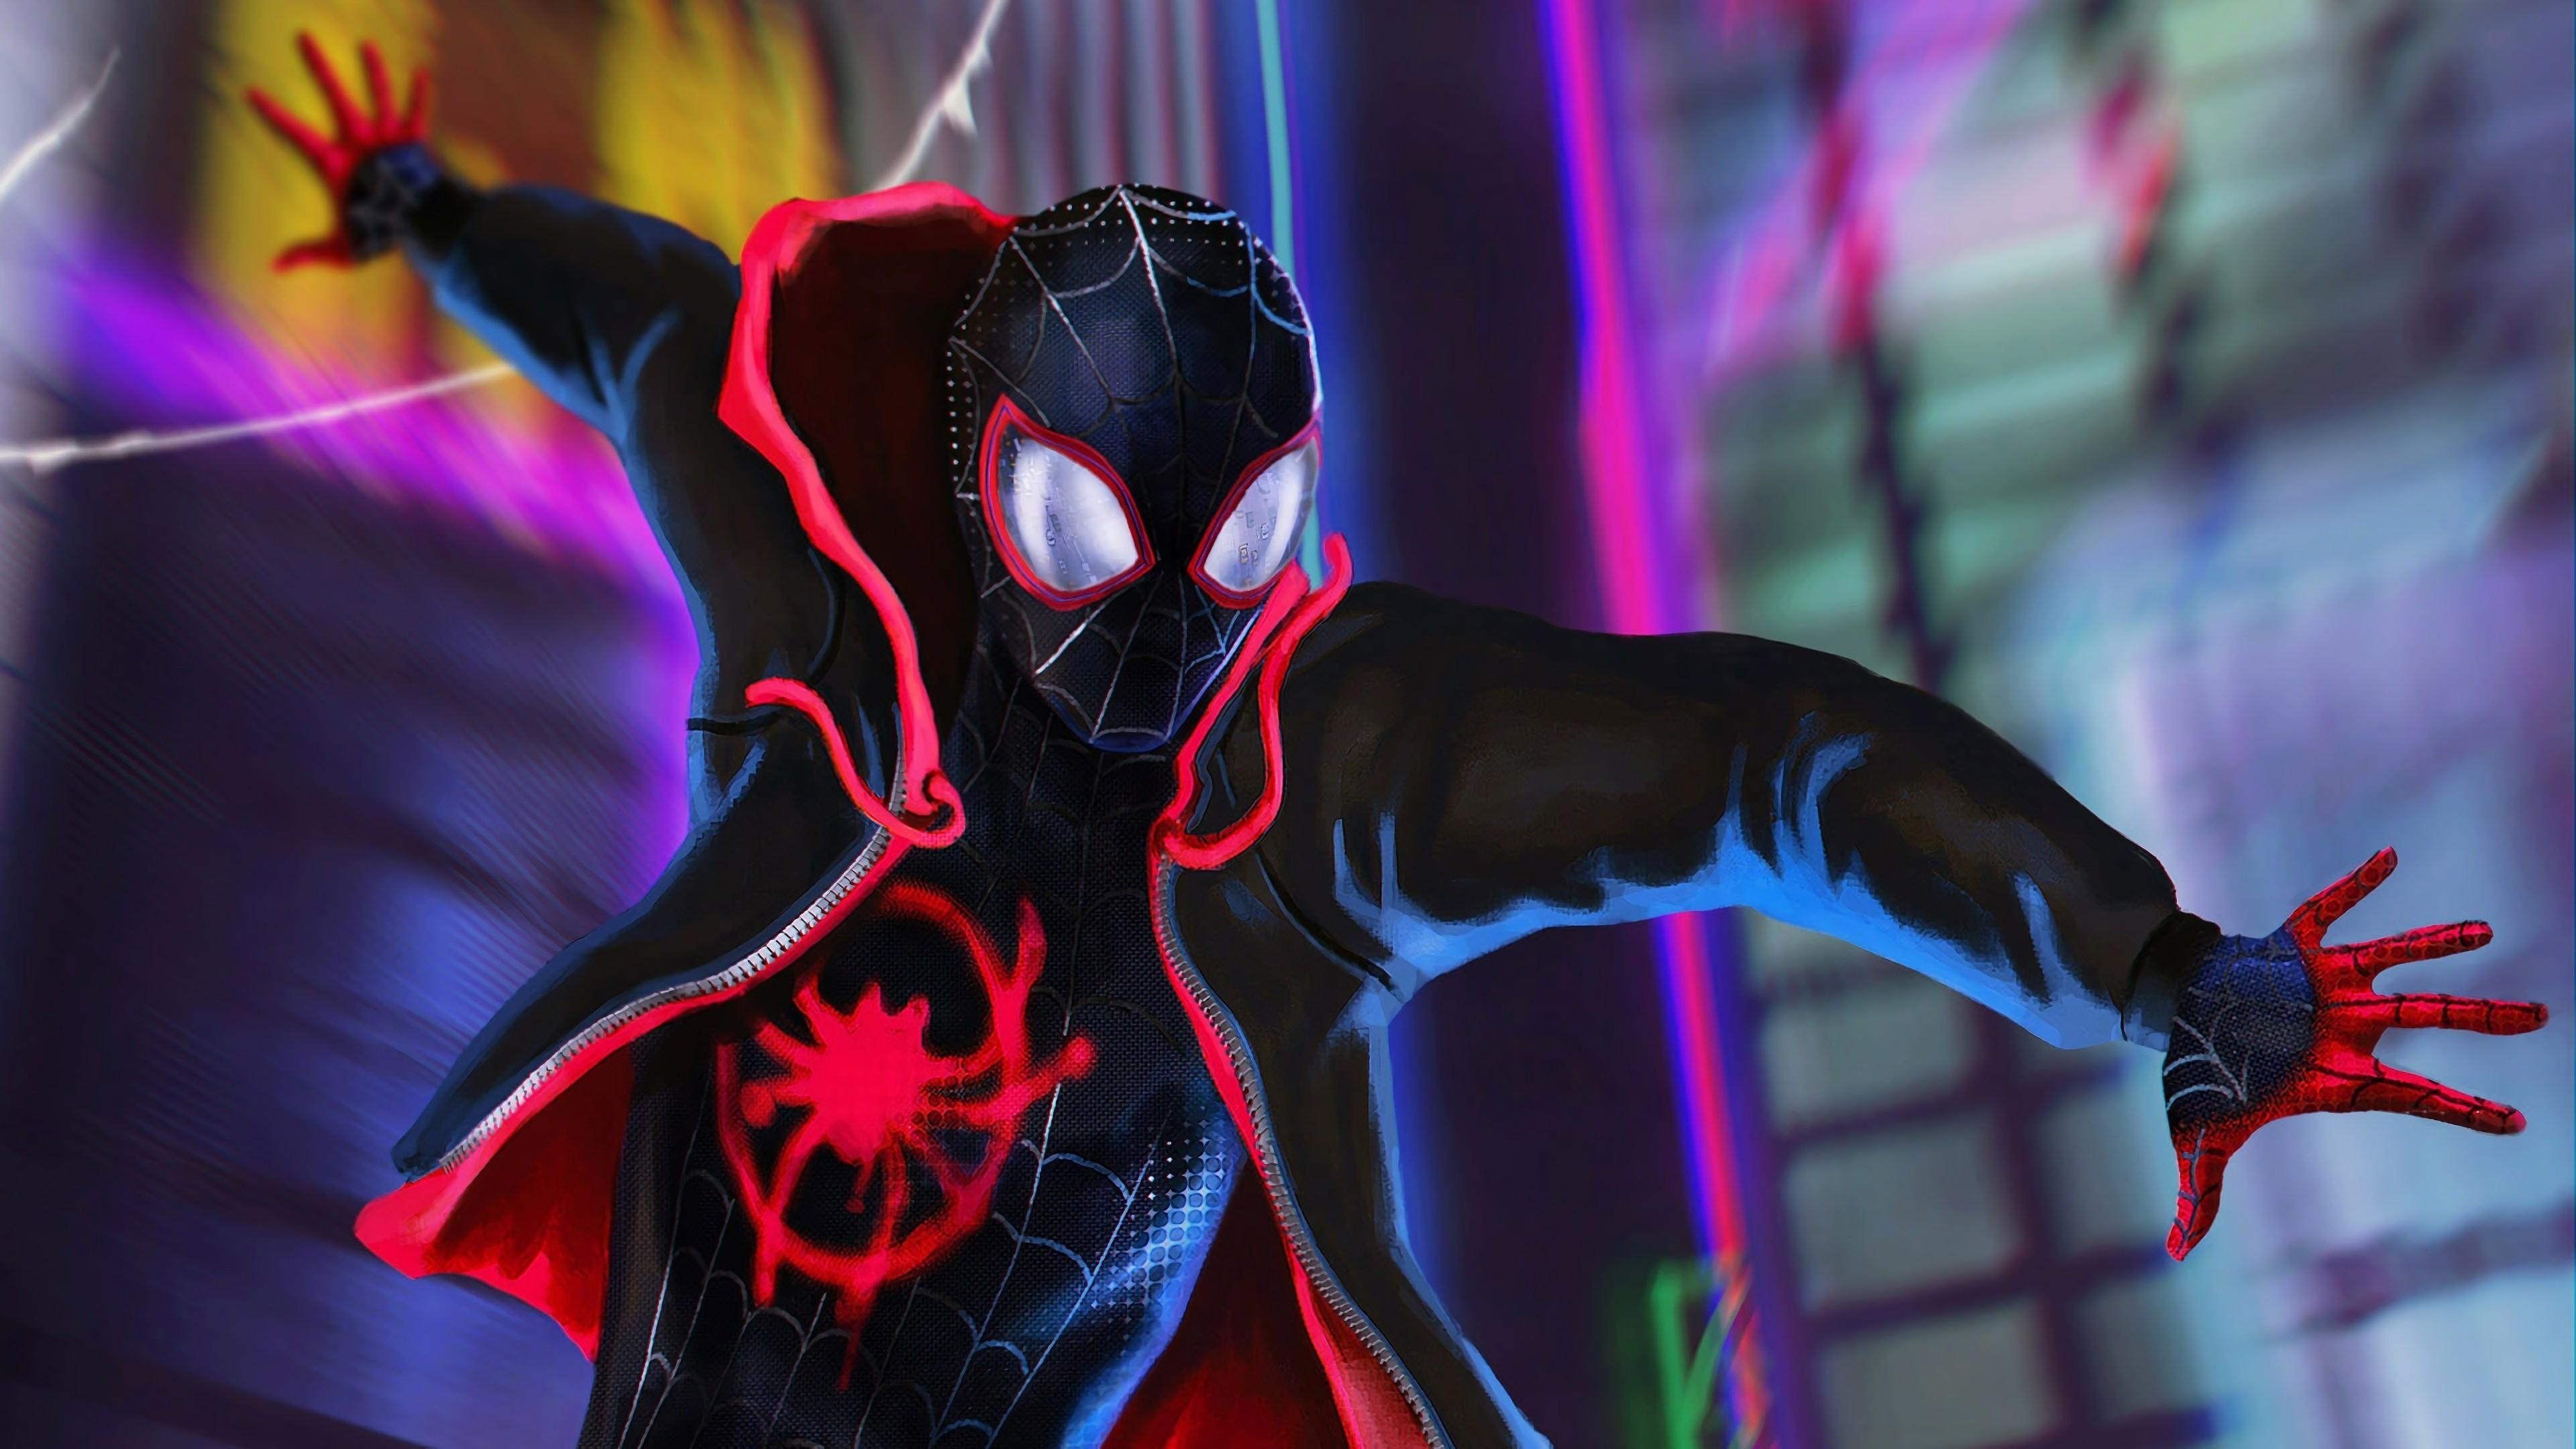 Spider-Man 4K Wallpapers - Wallpaper Cave